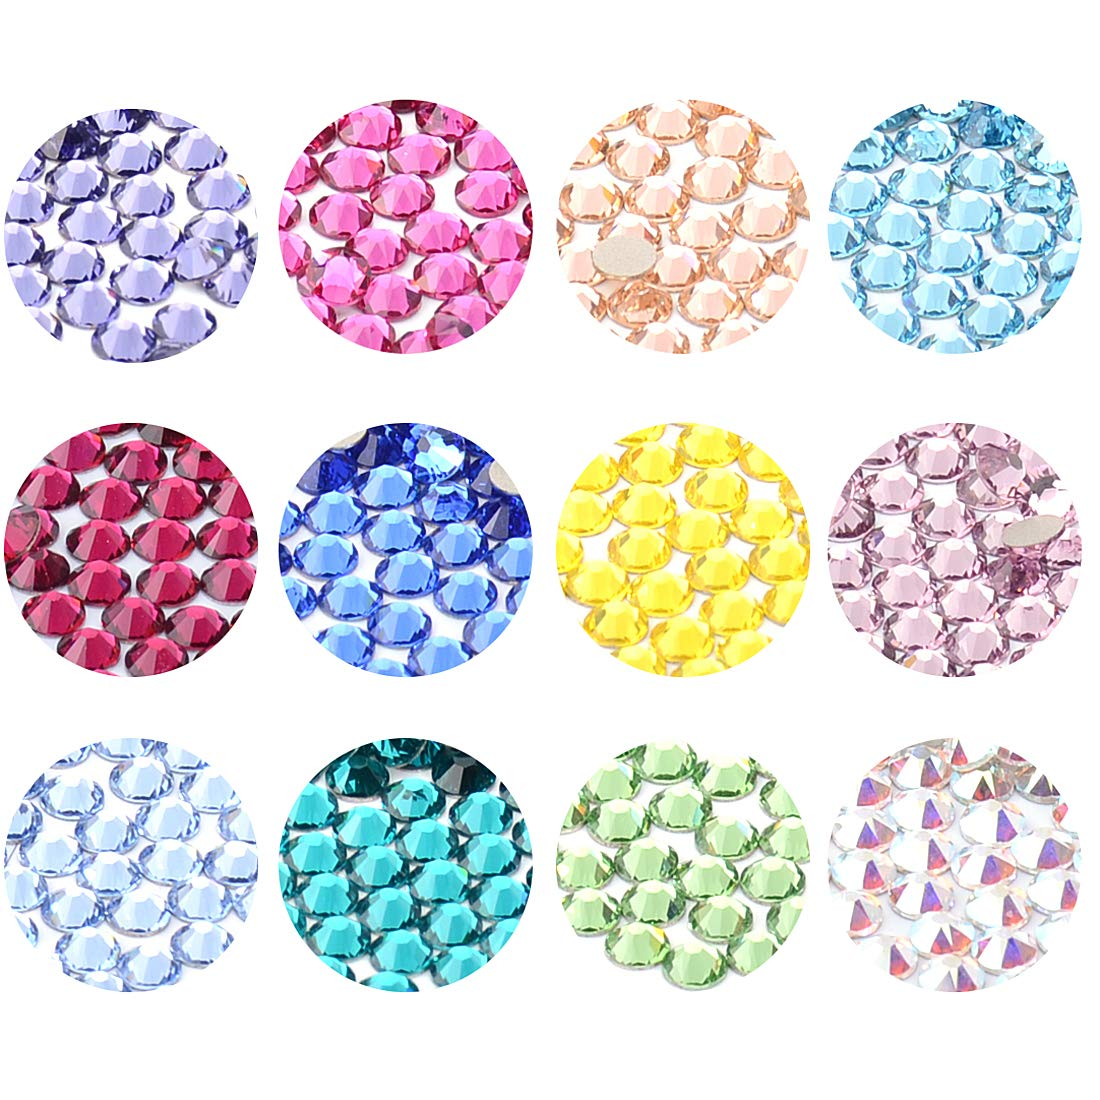 MSBeads Swarovski 2058/2088 Crystal Flatbacks Rhinestones SS16 with Aquamarine/Crytal AB/Blue Zircon/Citrine/Fuchsia/Light Amethyst/Light Peach/Light Sapphire/Peridot/Ruby/Sapphire/Tanzanite